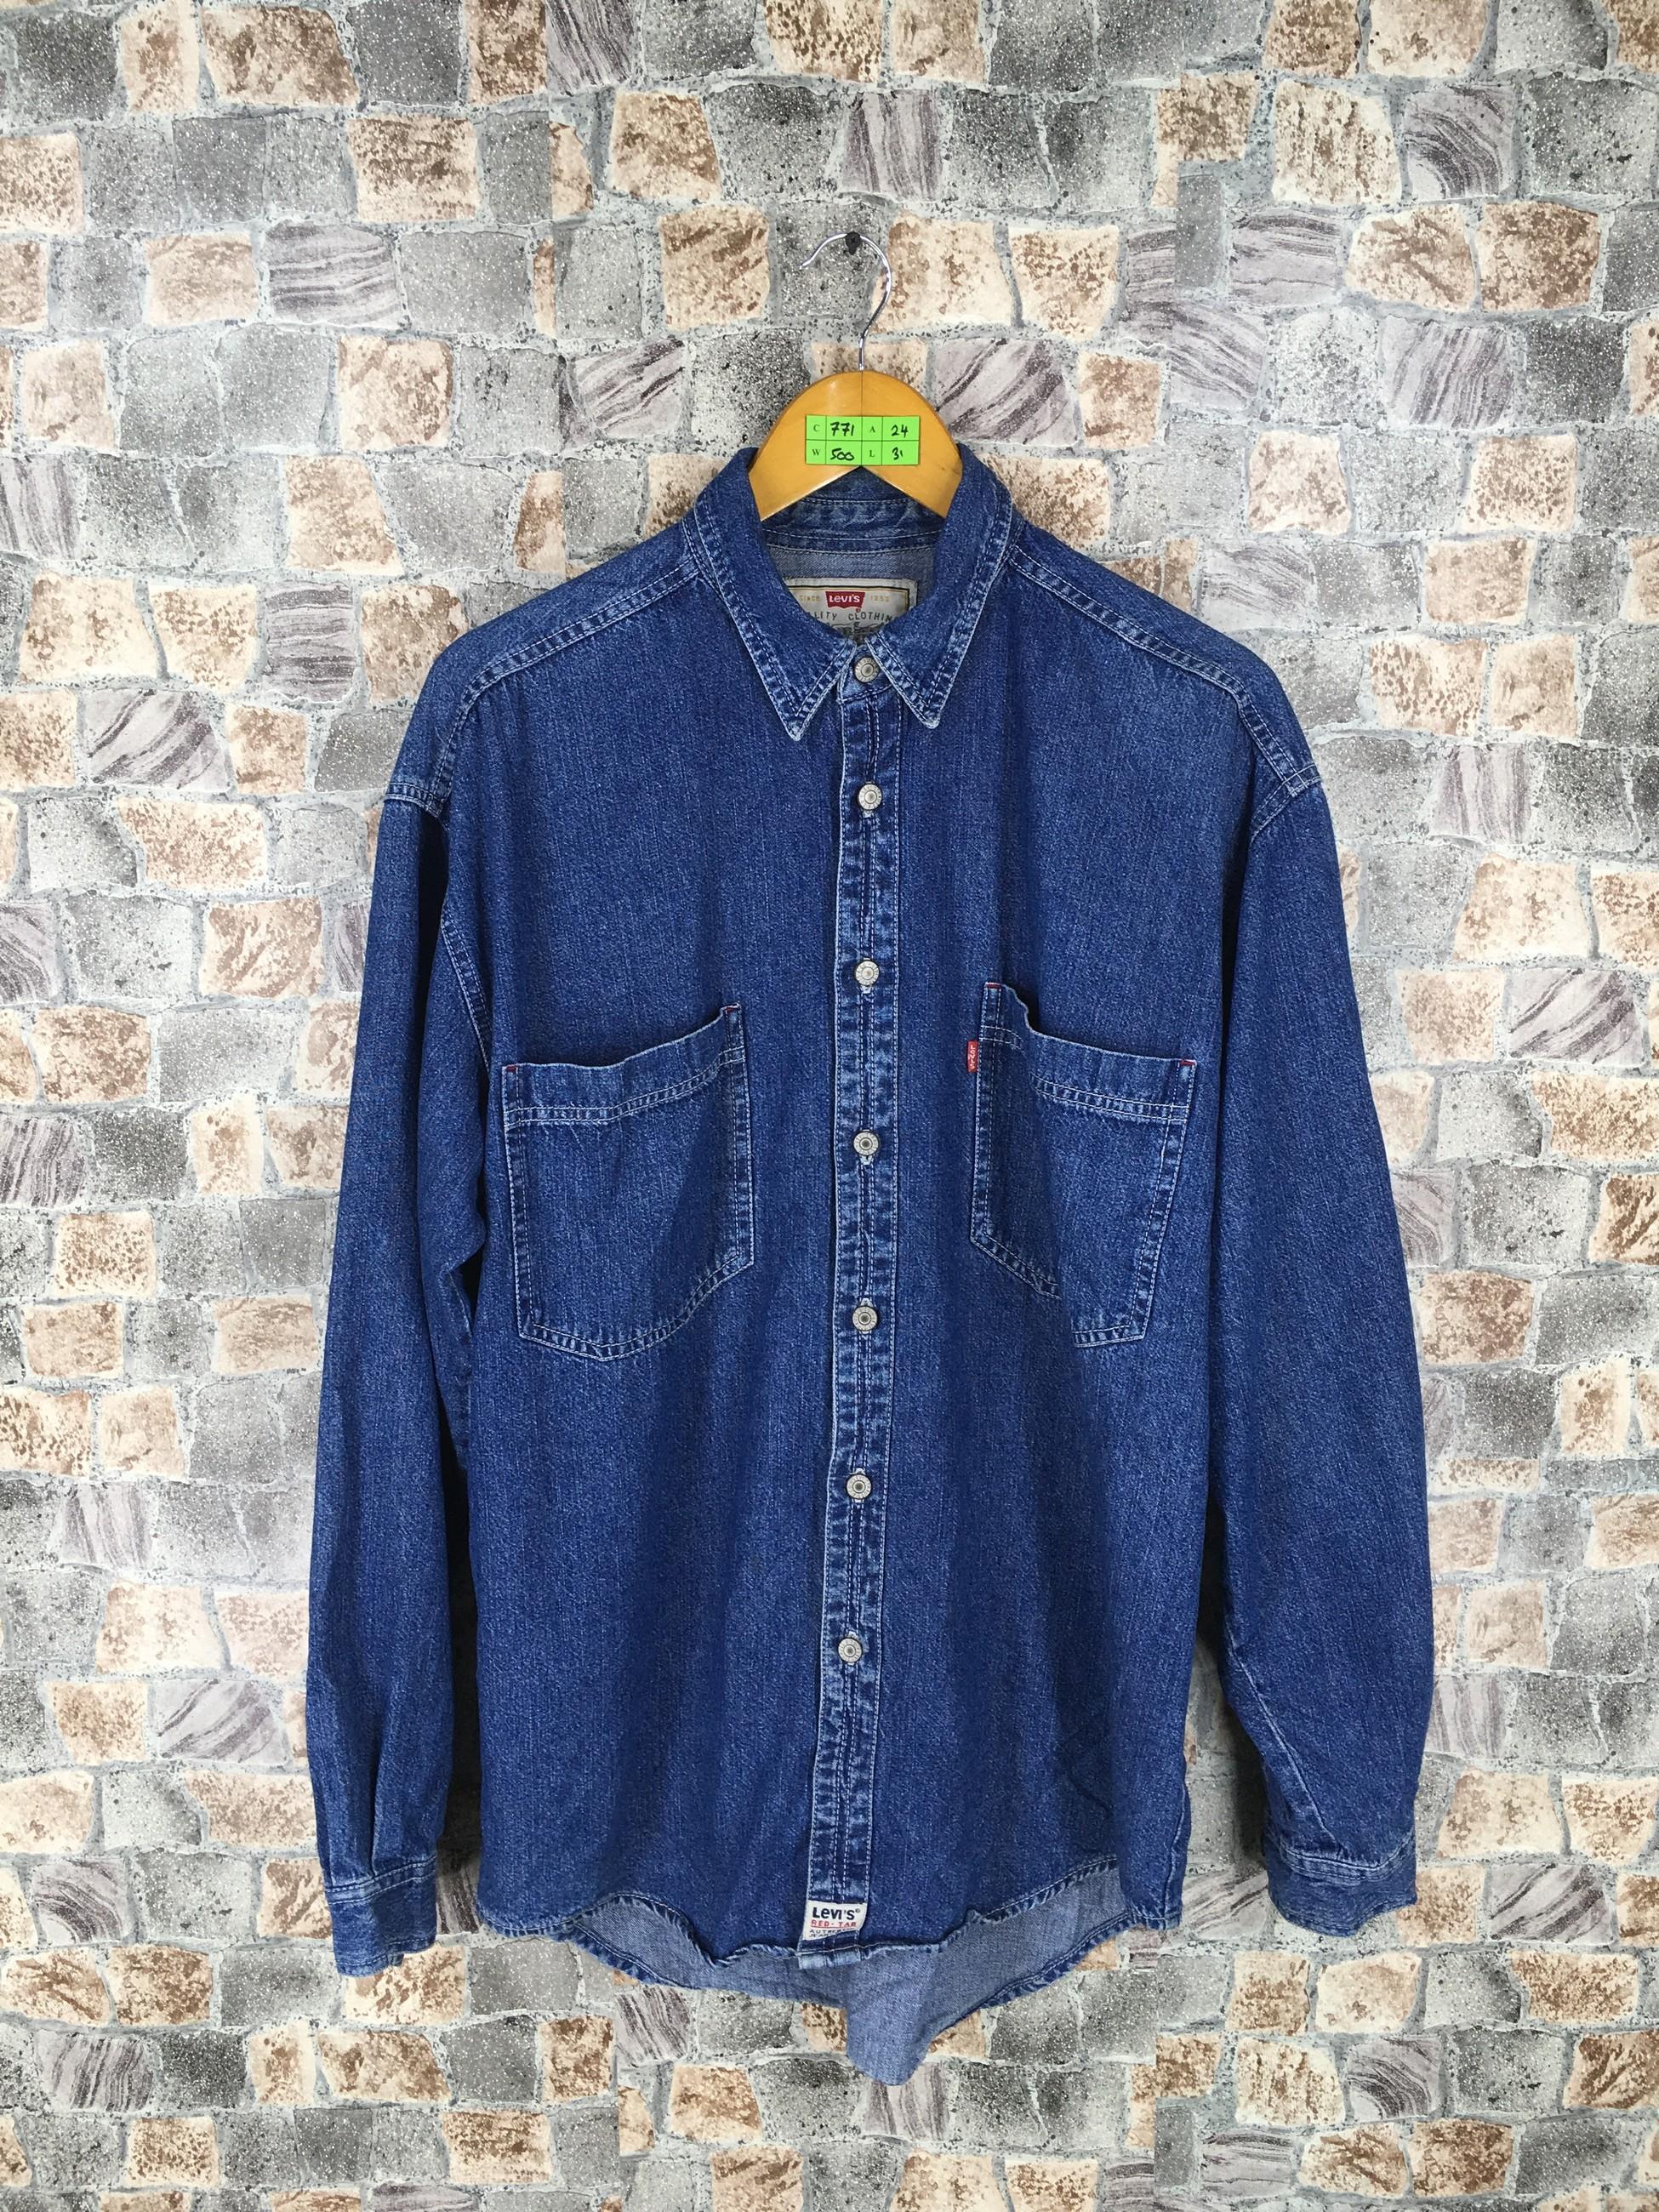 7eba1298e75 Levi s ×. LEVIS Strauss Denim Shirt Men Women Medium Vintage 90 s Levis  Jeans Grunge Style Western Shirt Buttondown Workers Denim Blue ...